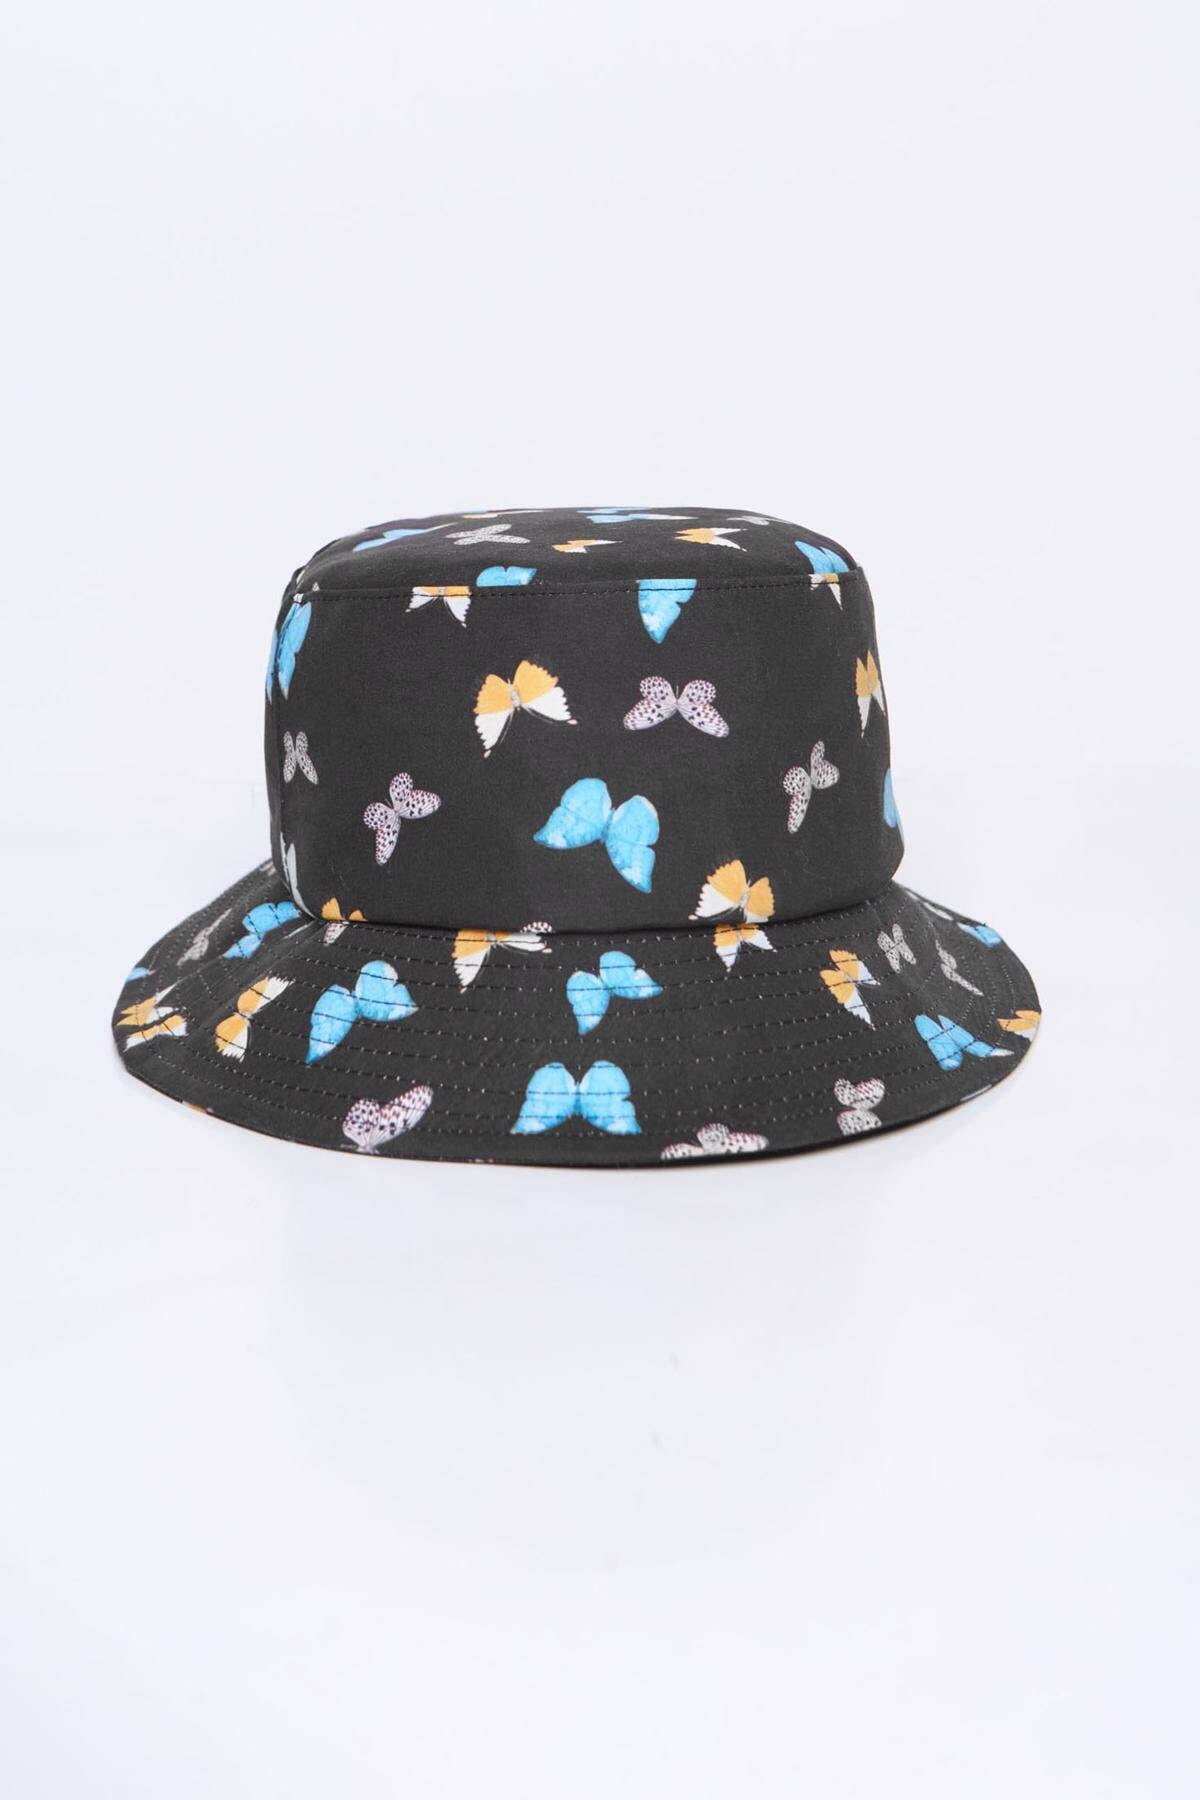 Addax Kadın Siyah Mavi Şapka Şpk1045 - E1 Adx-0000023856 2